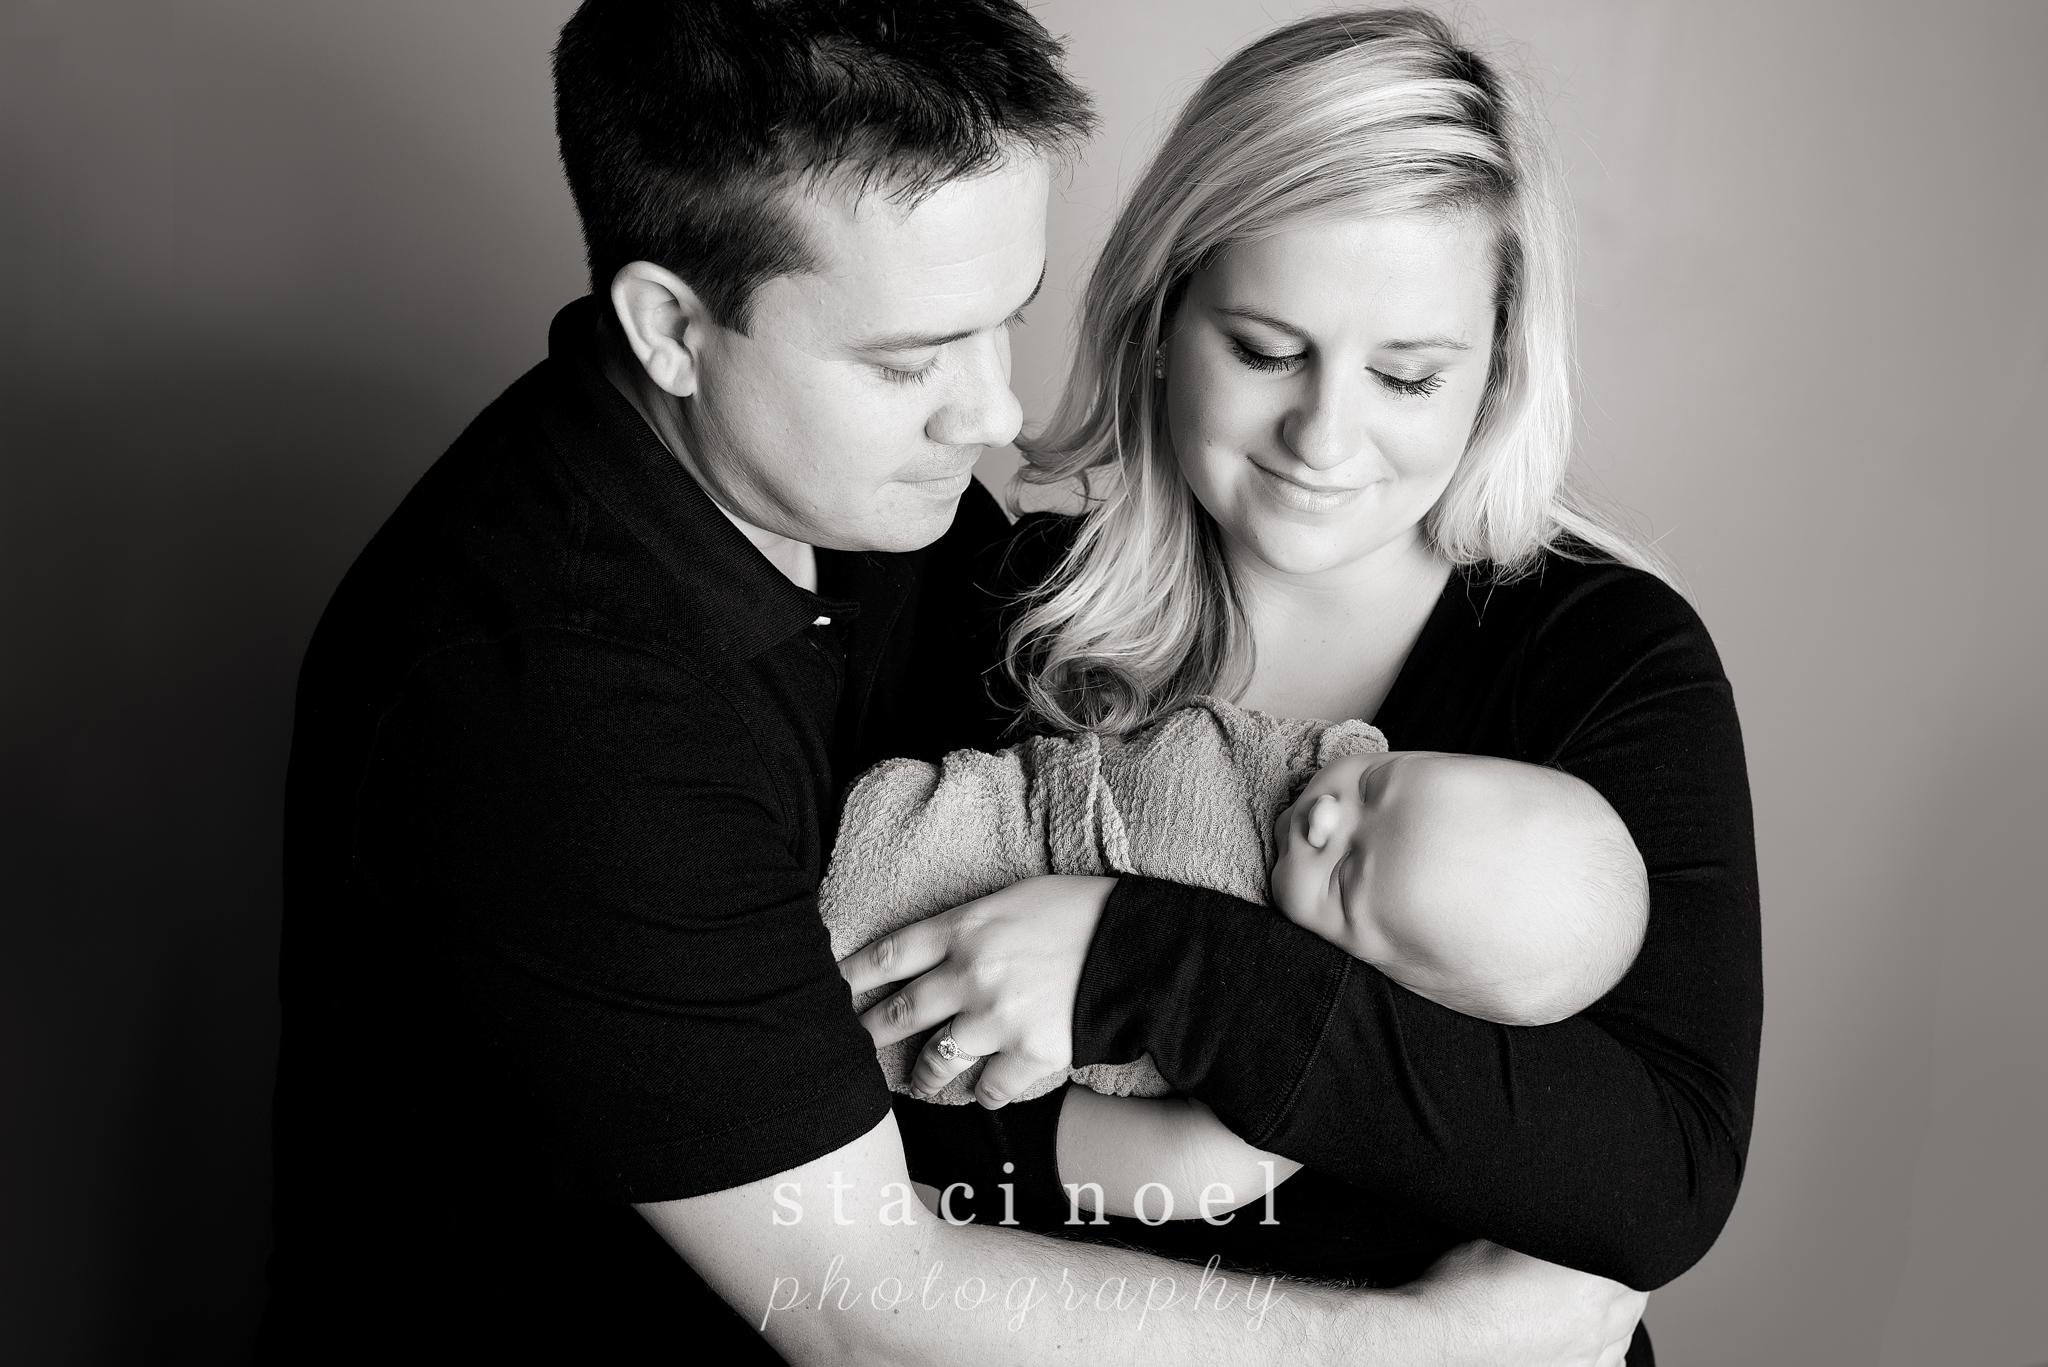 staci.noel.photography.newborn.boy.charlotte.nc2.jpg